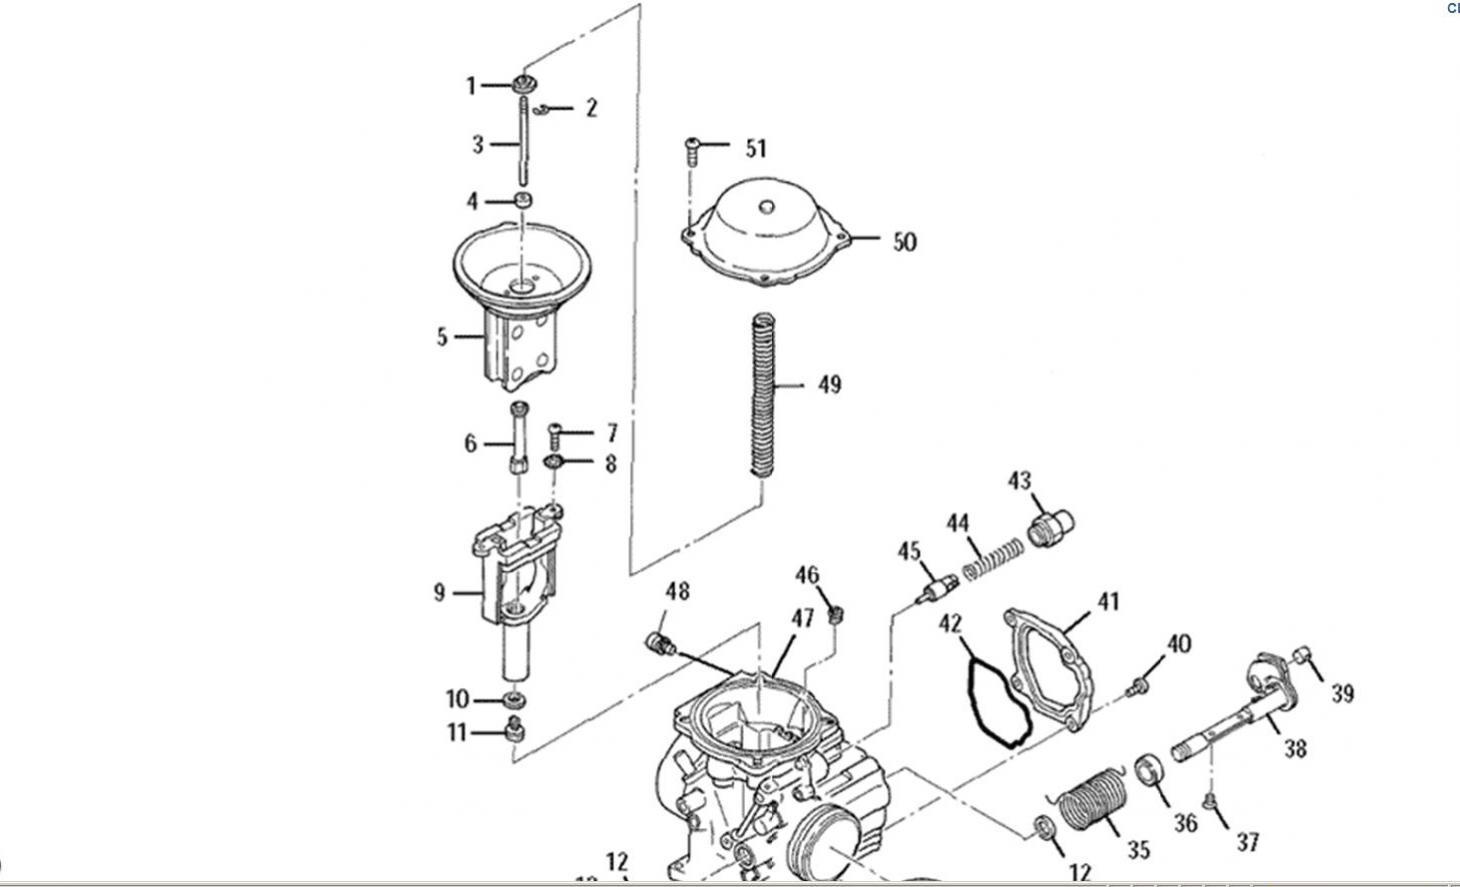 hight resolution of sportsman 400 carb removal polaris atv forum 1996 polaris xplorer 400 carburetor diagram polaris ranger 400 carburetor diagram